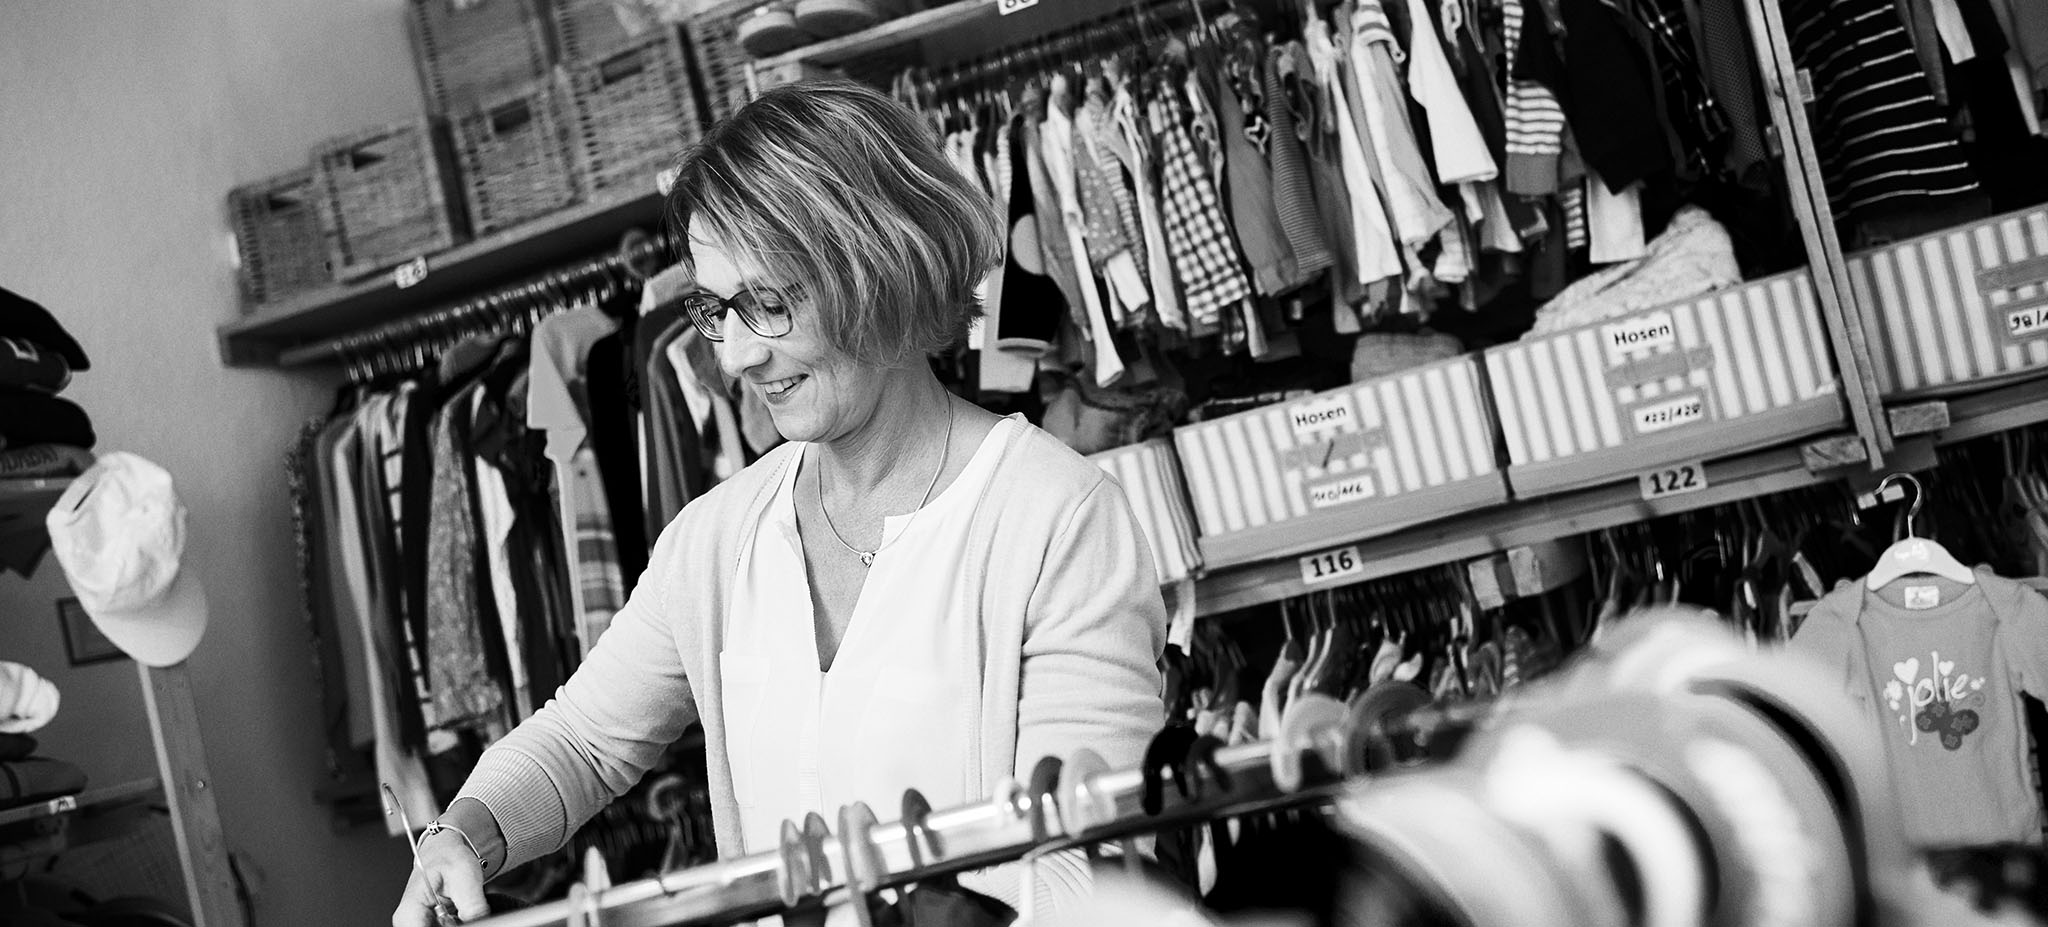 2.HeimArt – Soziale Boutique